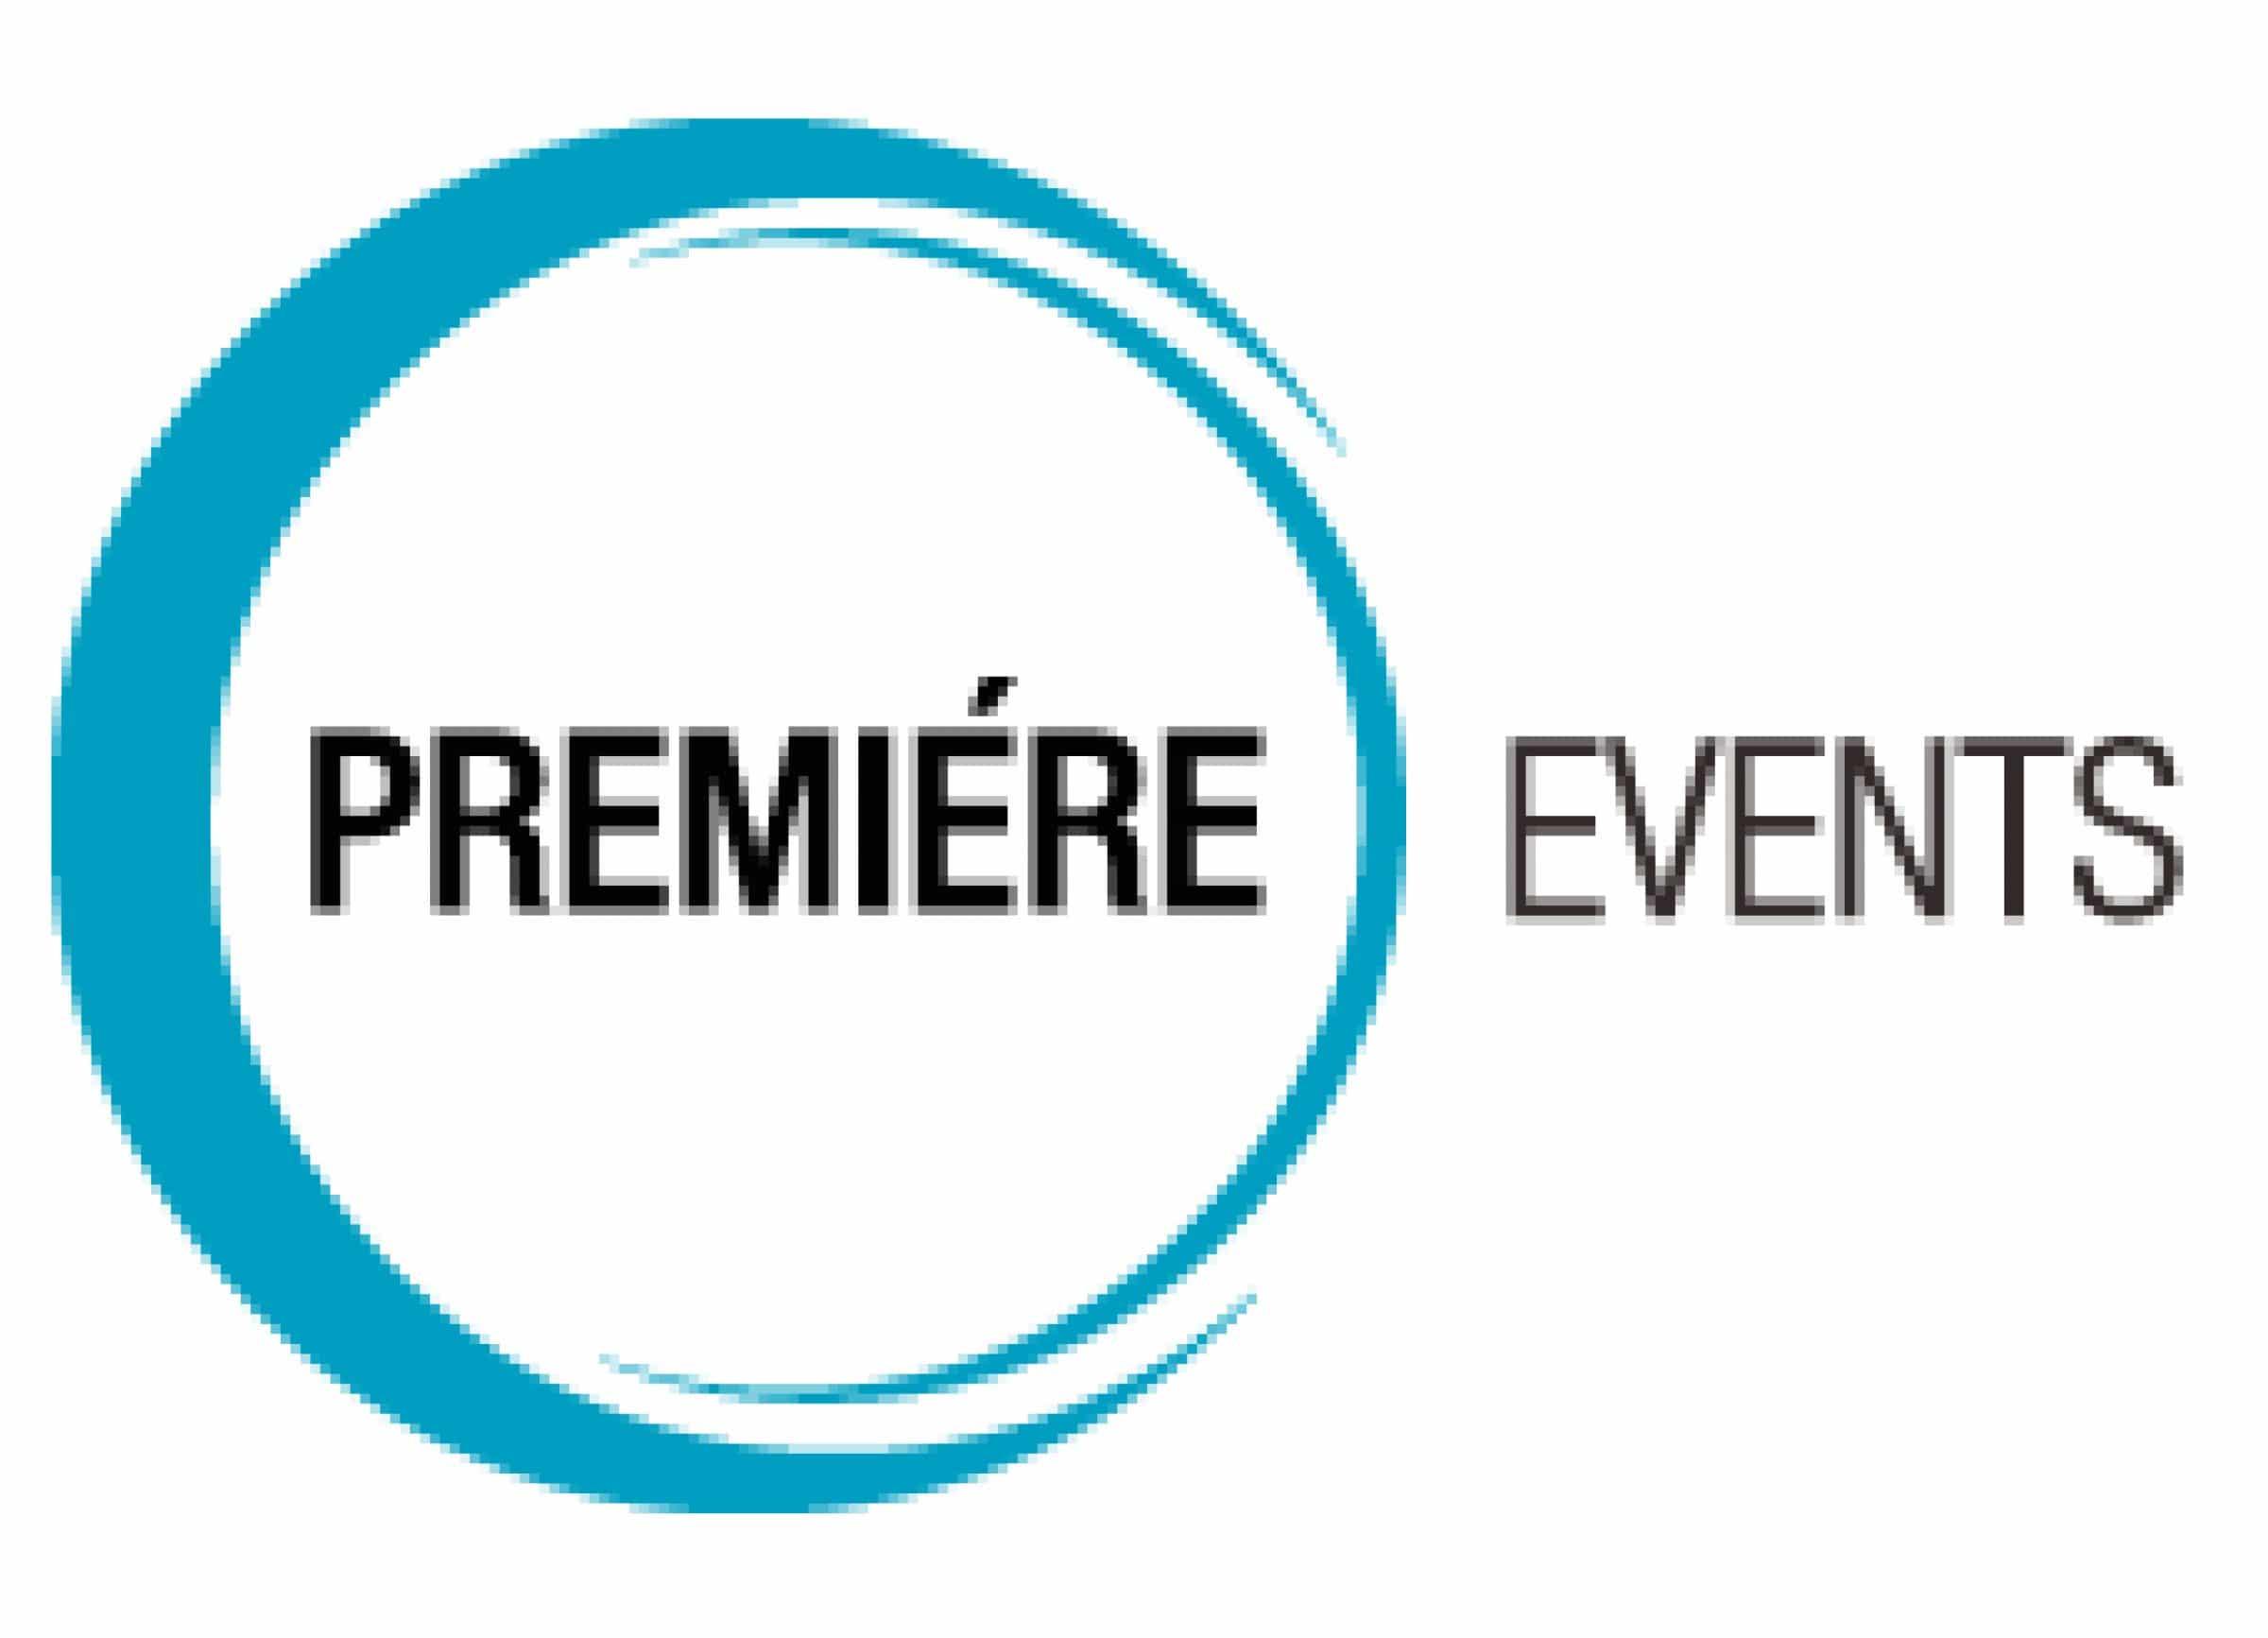 premiere events logo